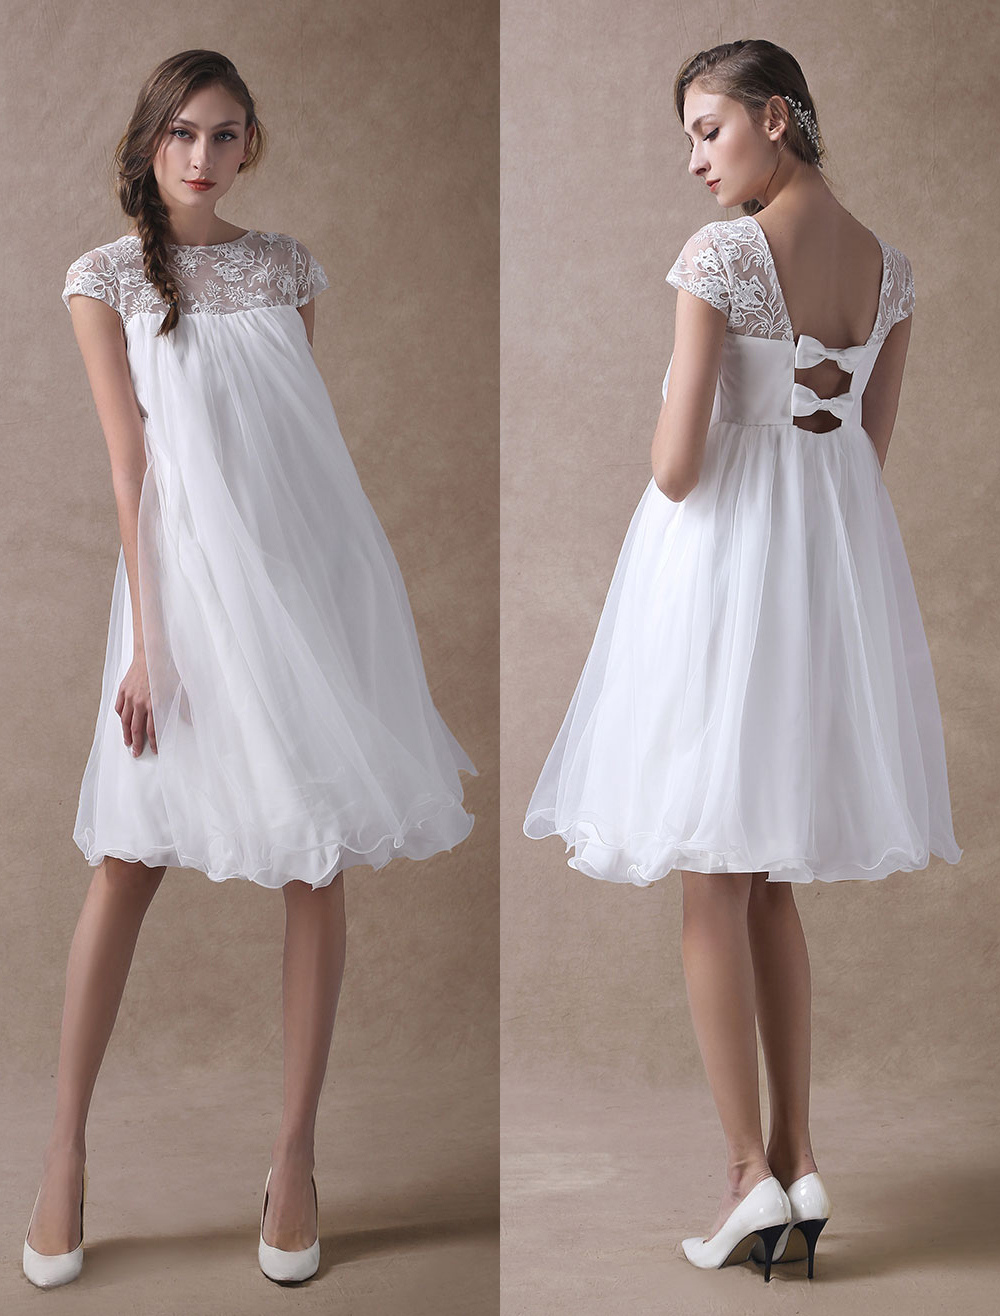 Simple Wedding Dresses Short Empire Waist Lace Tulle Cap Sleeve Pregnant Bridal Dress